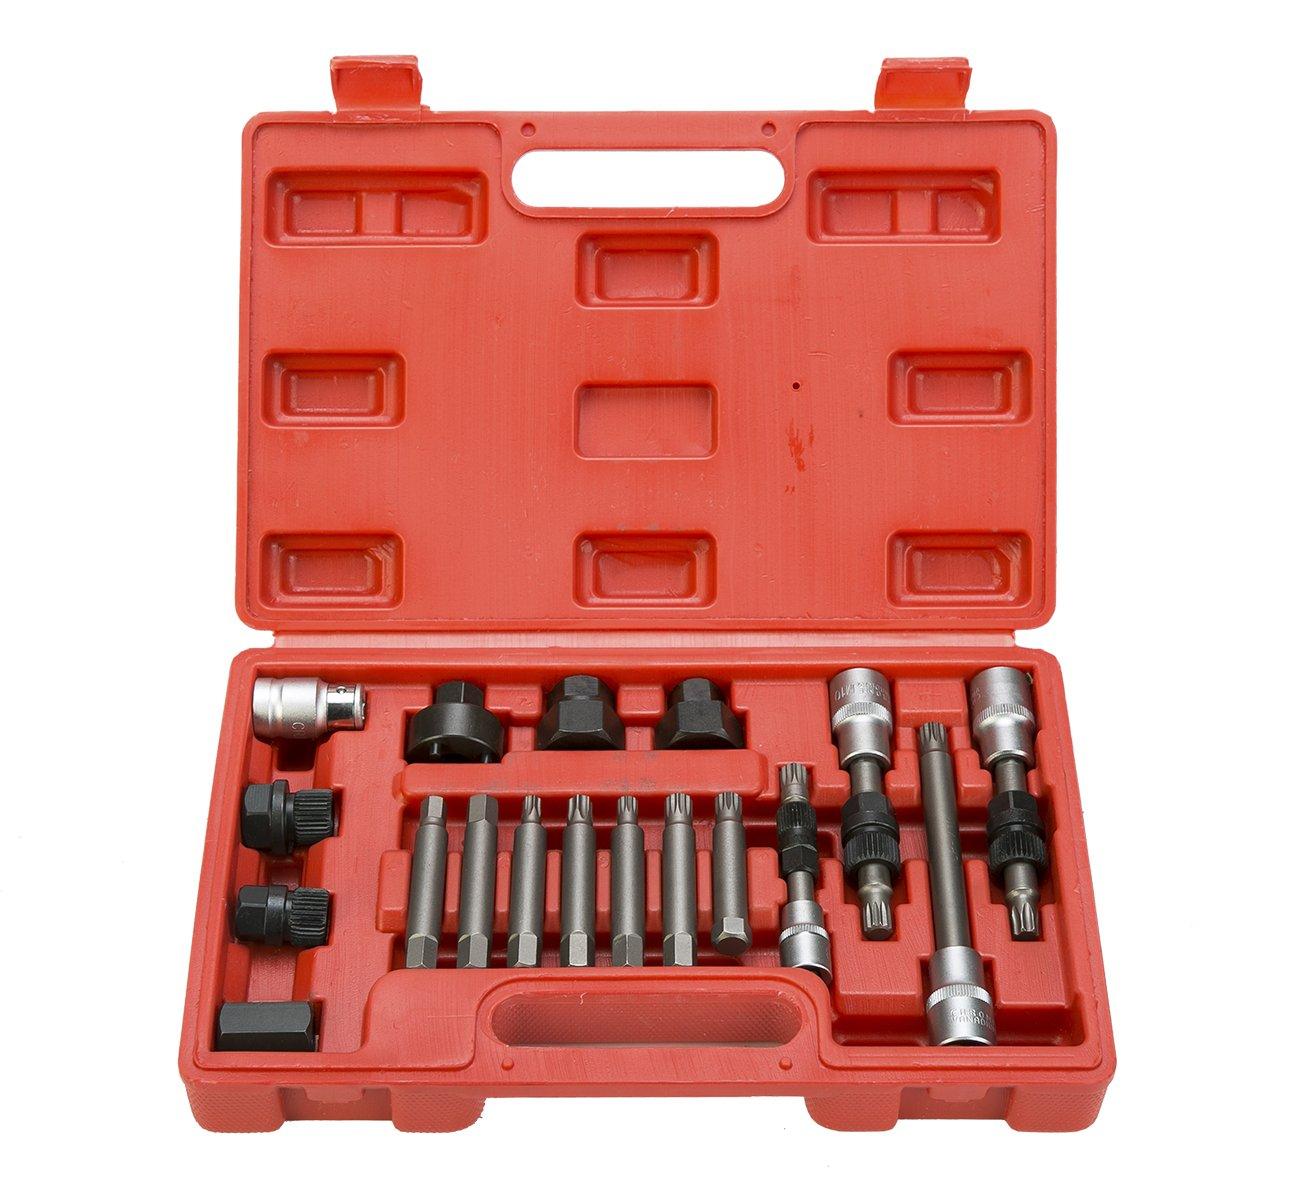 8MILELAKE 18 Pcs Alternator Pulley Service Decoupler Insert Bit Socket Set Tool Kit Car Pulley Removal Decoupling Puller